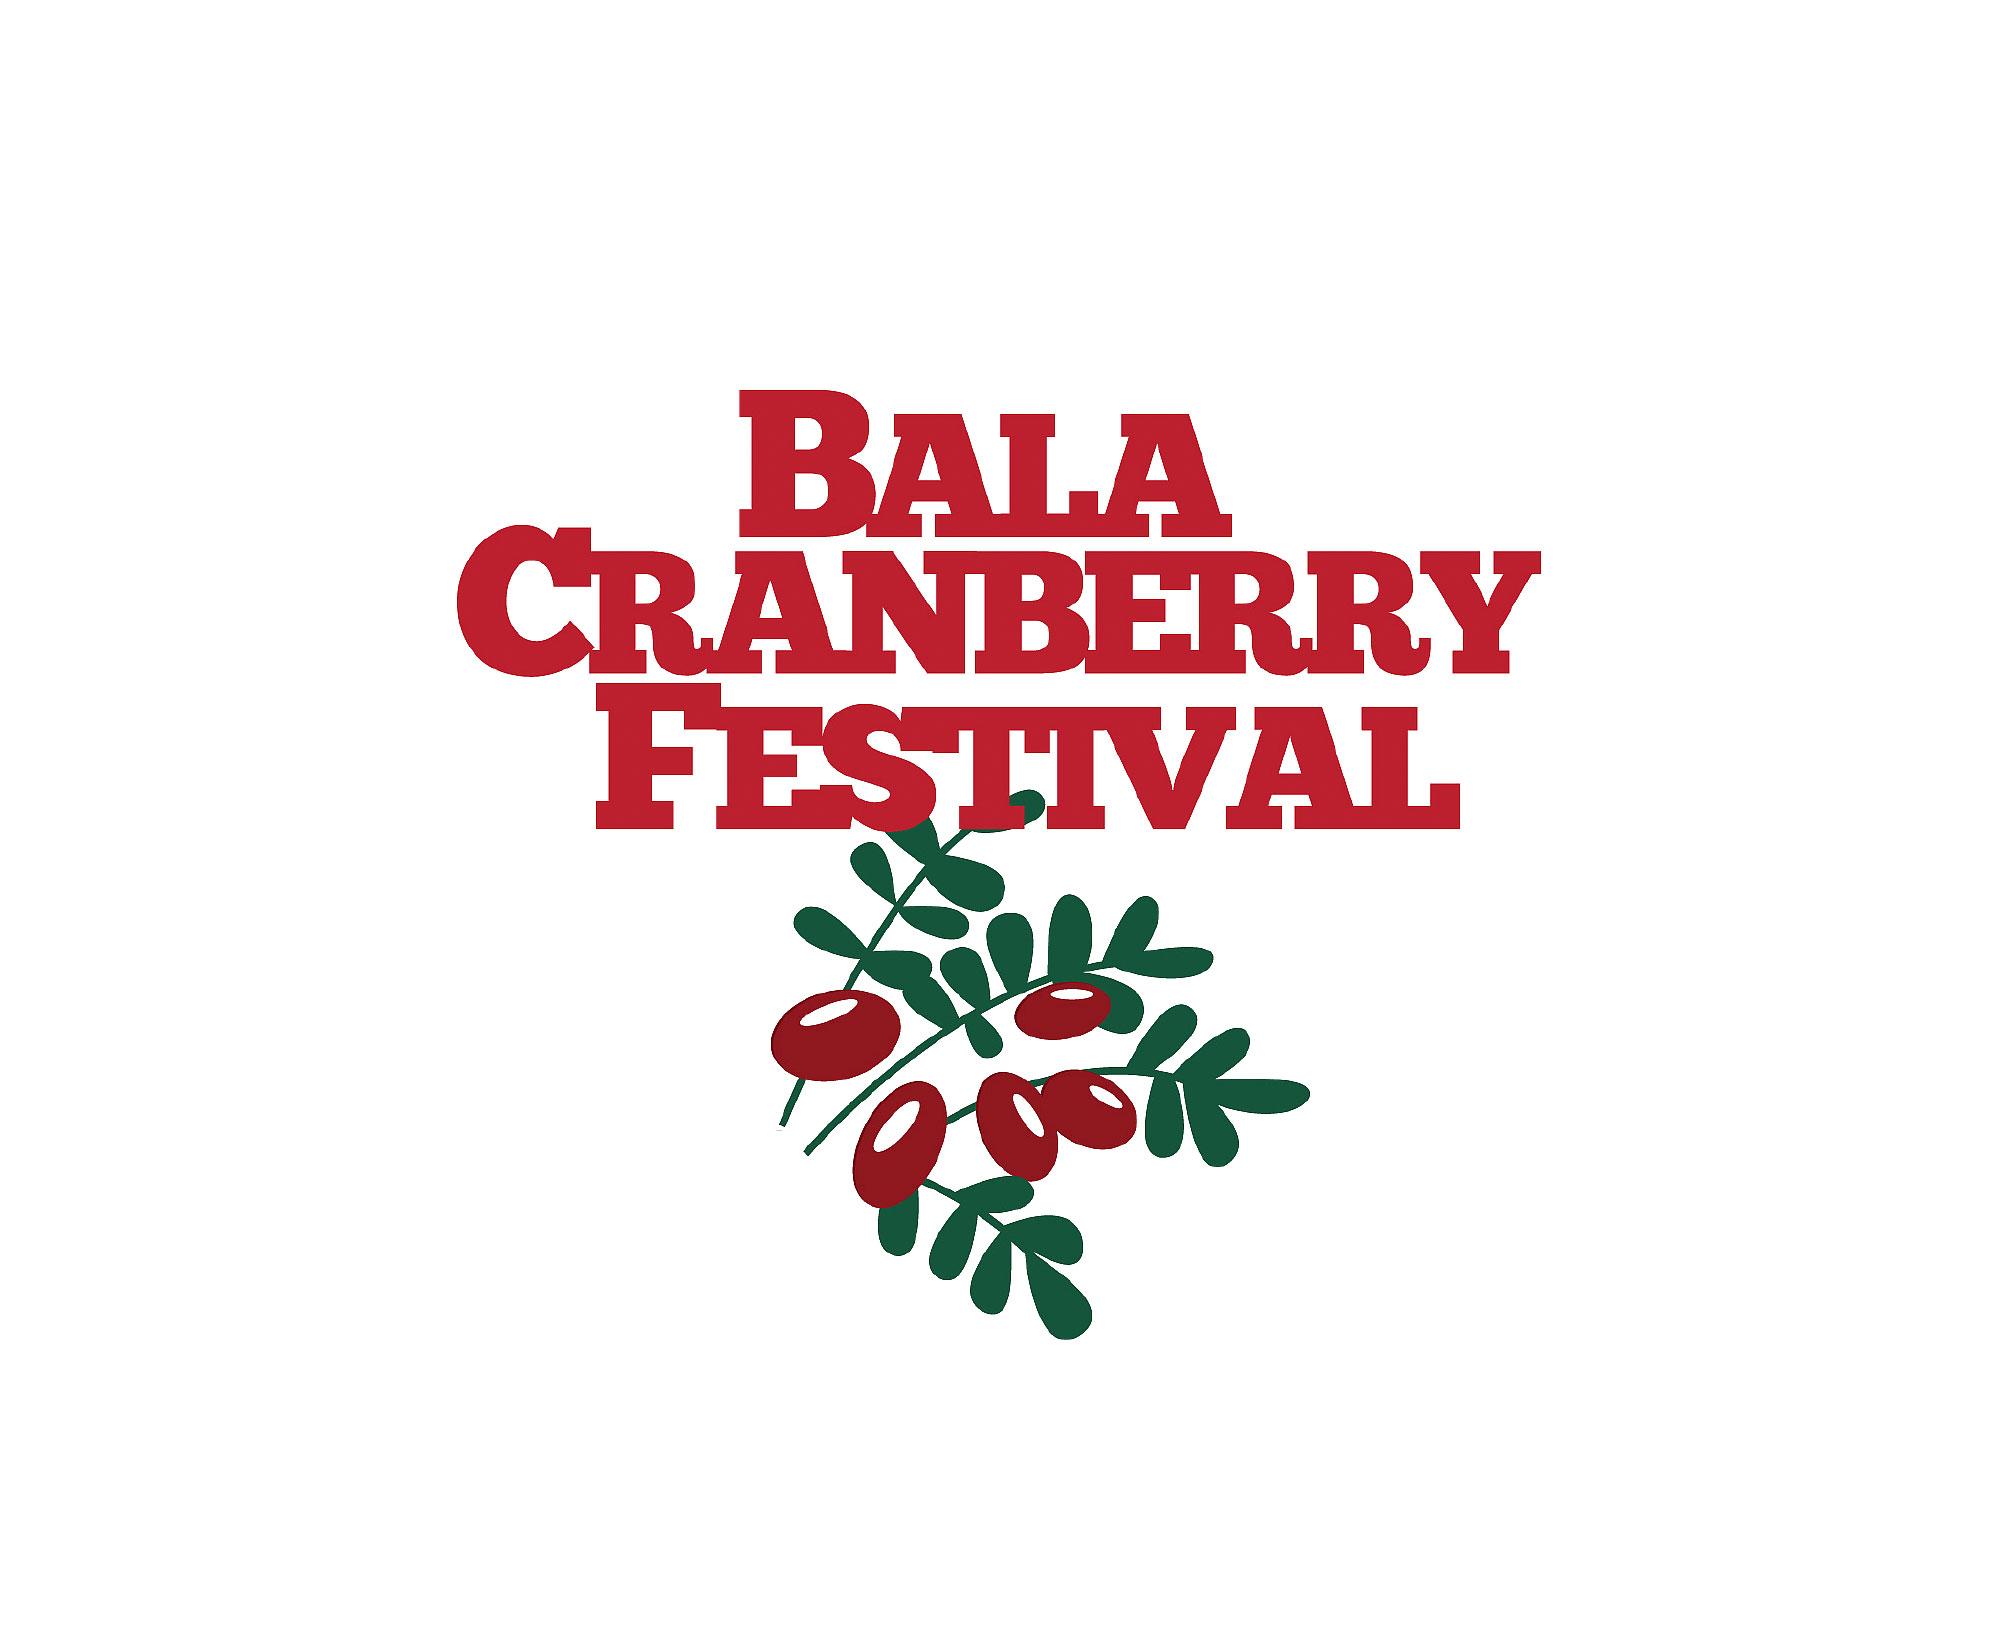 Bala Cranberry Festival – Oct. 14-16, 2016